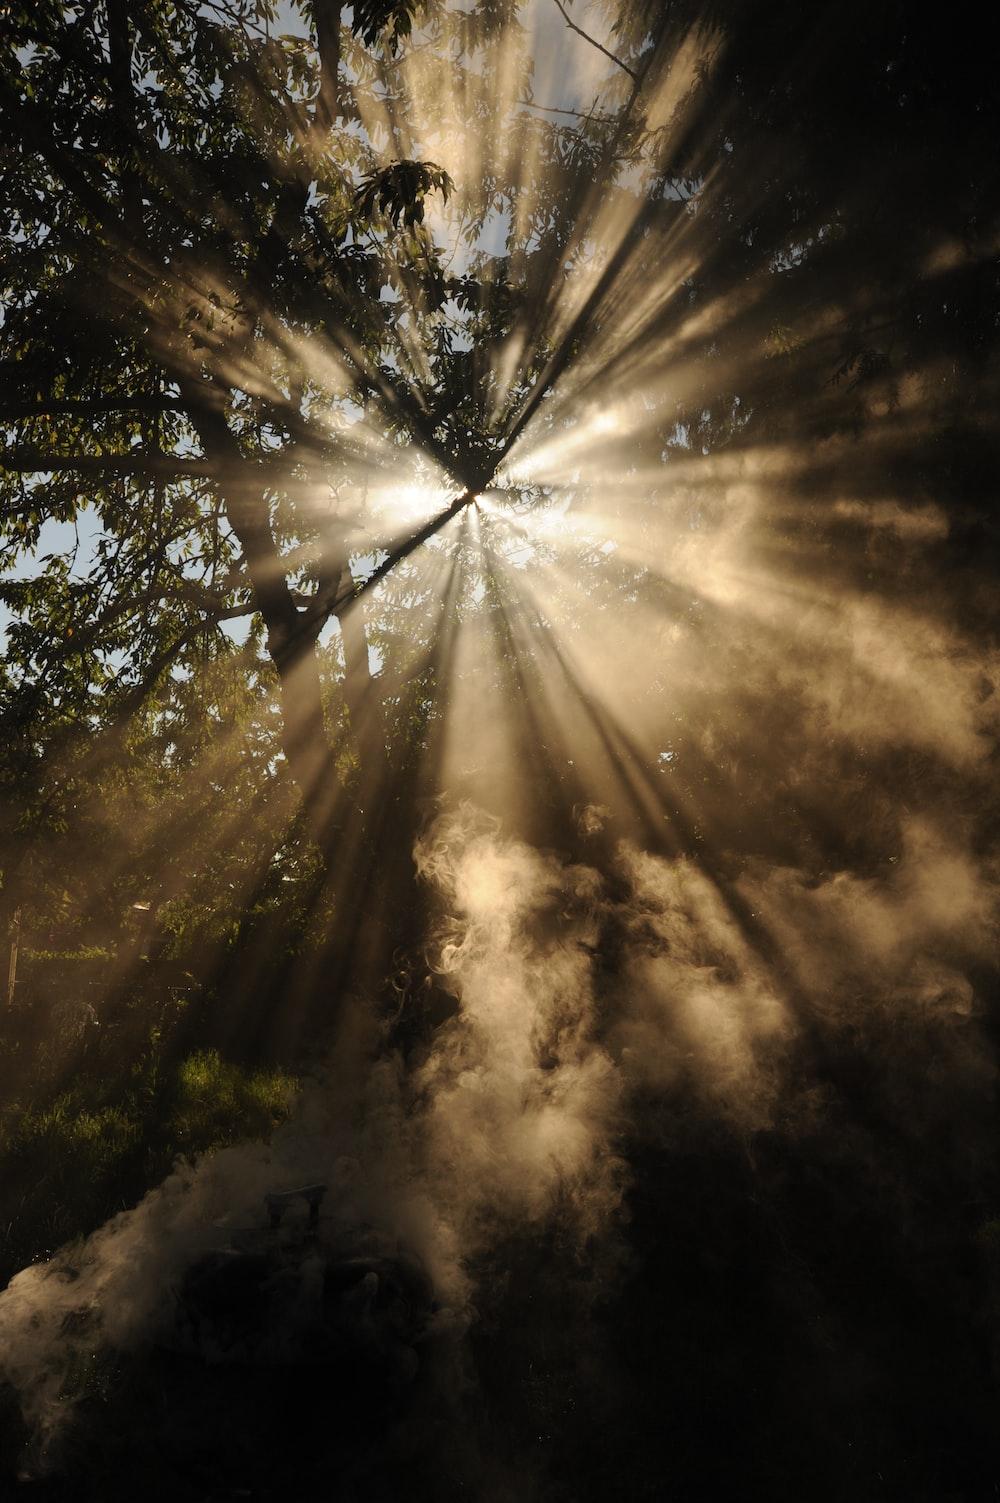 sun rays coming through trees